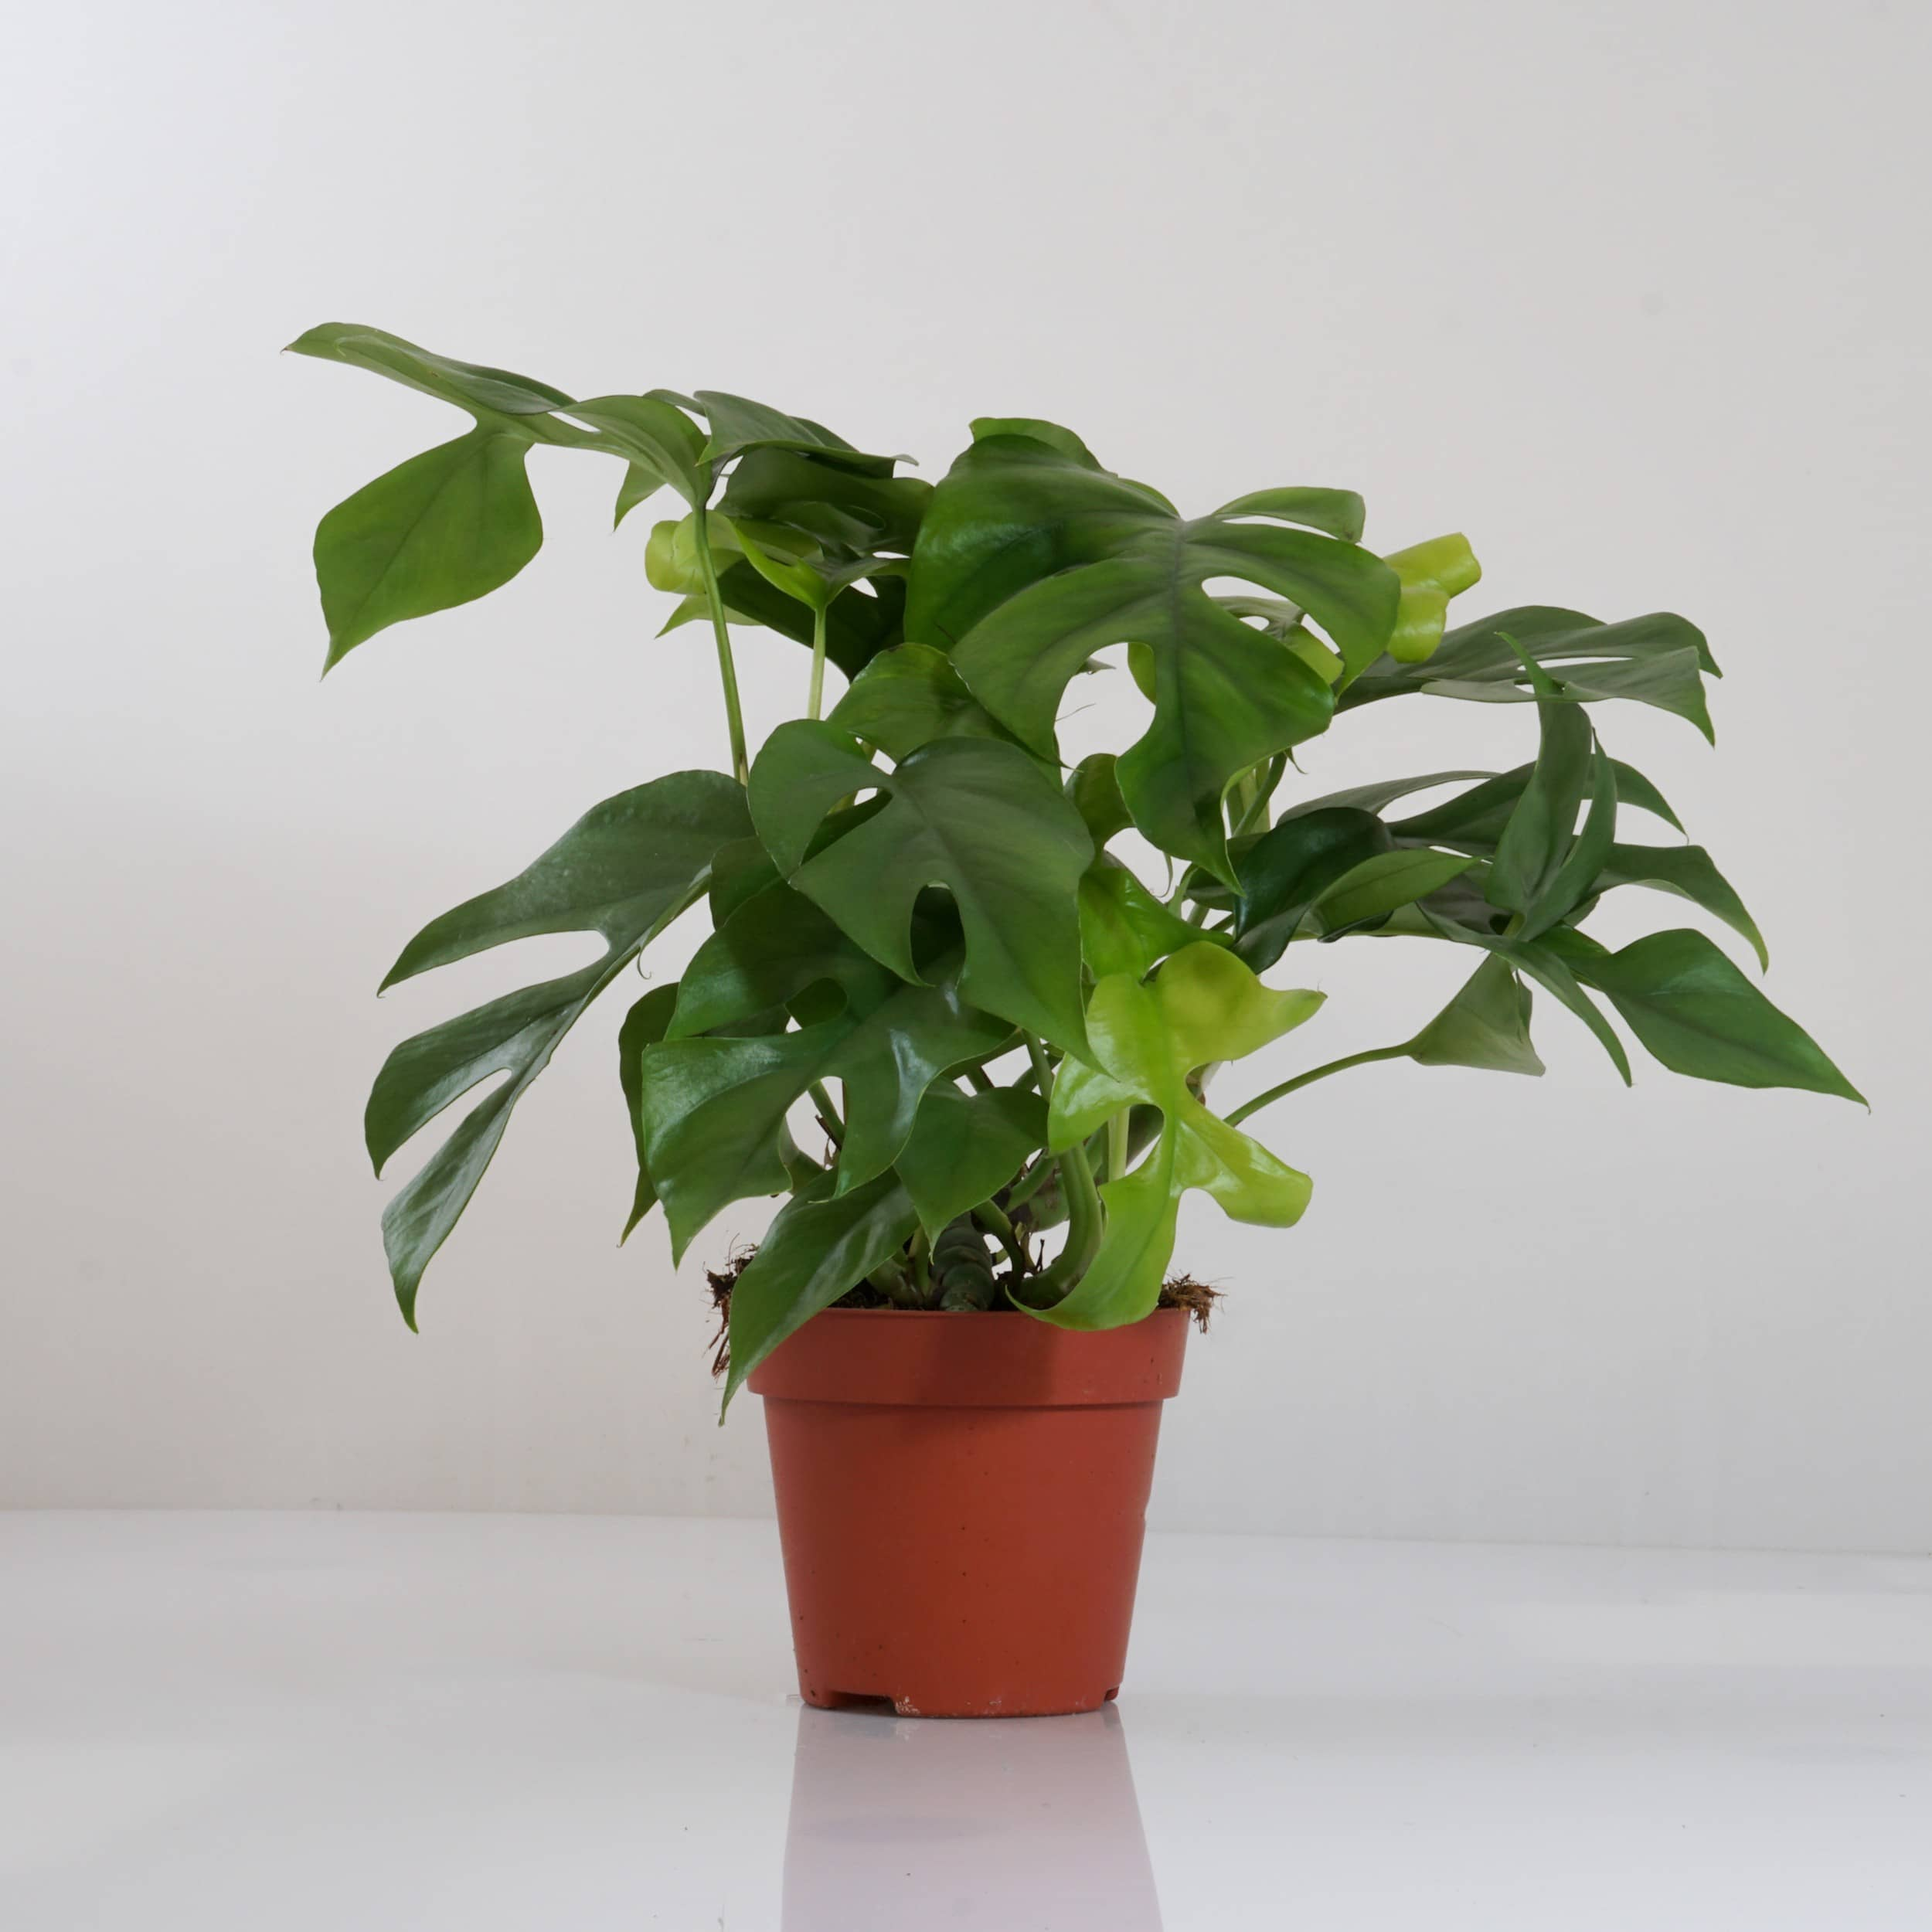 Monstera minima - Kleines Fensterblatt